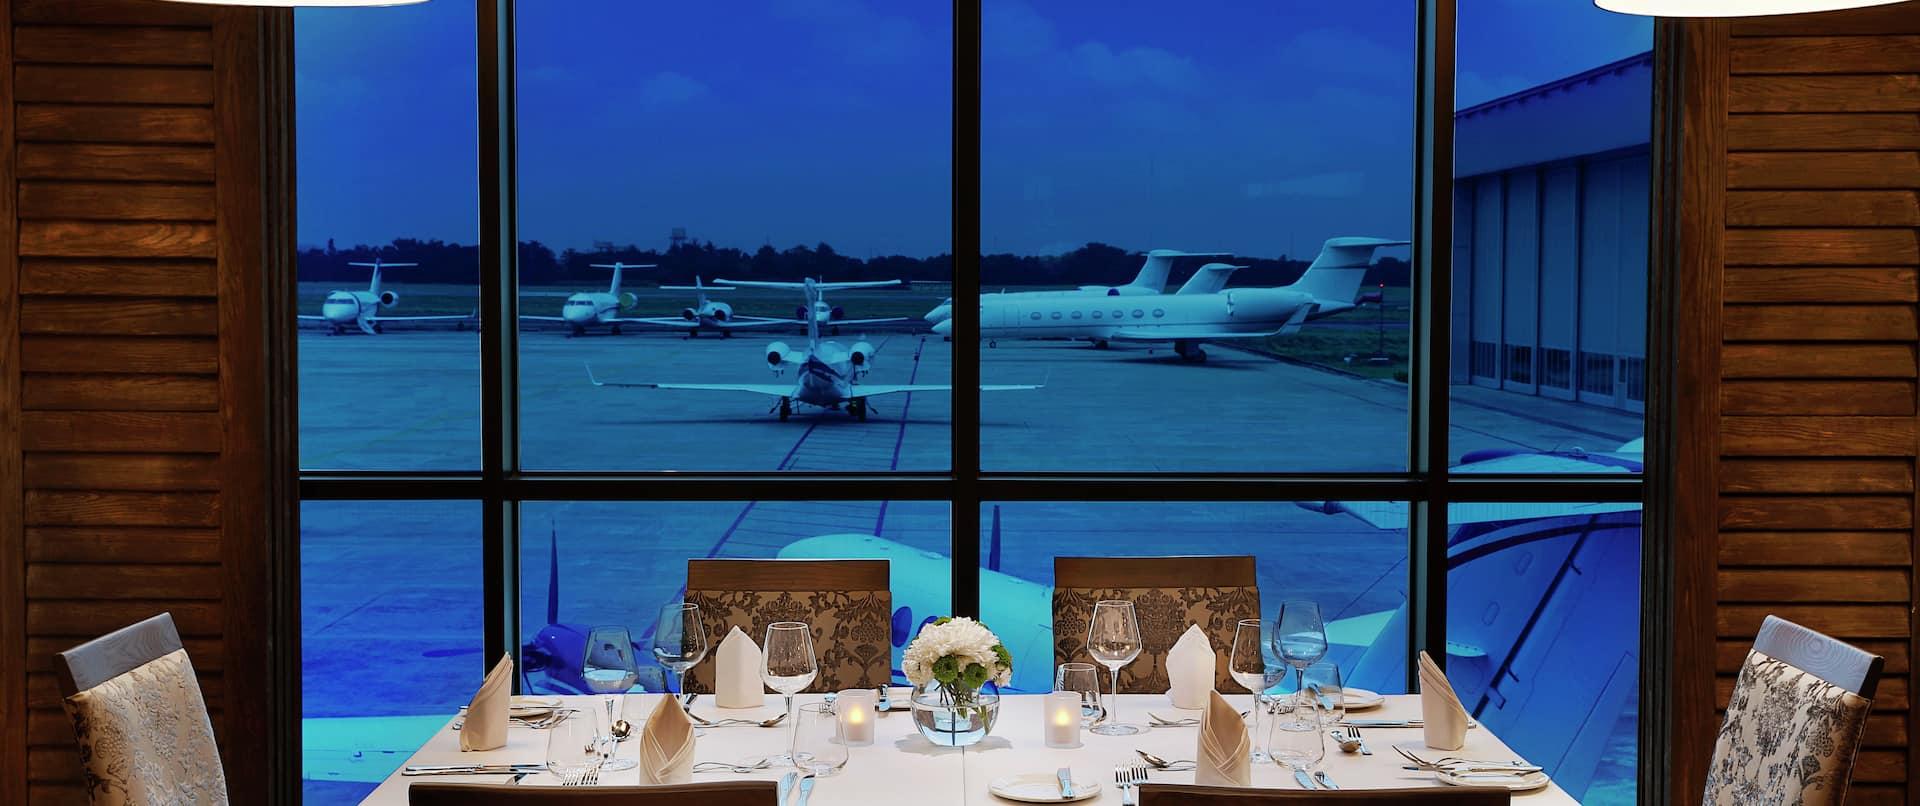 Restaurant Dining Table